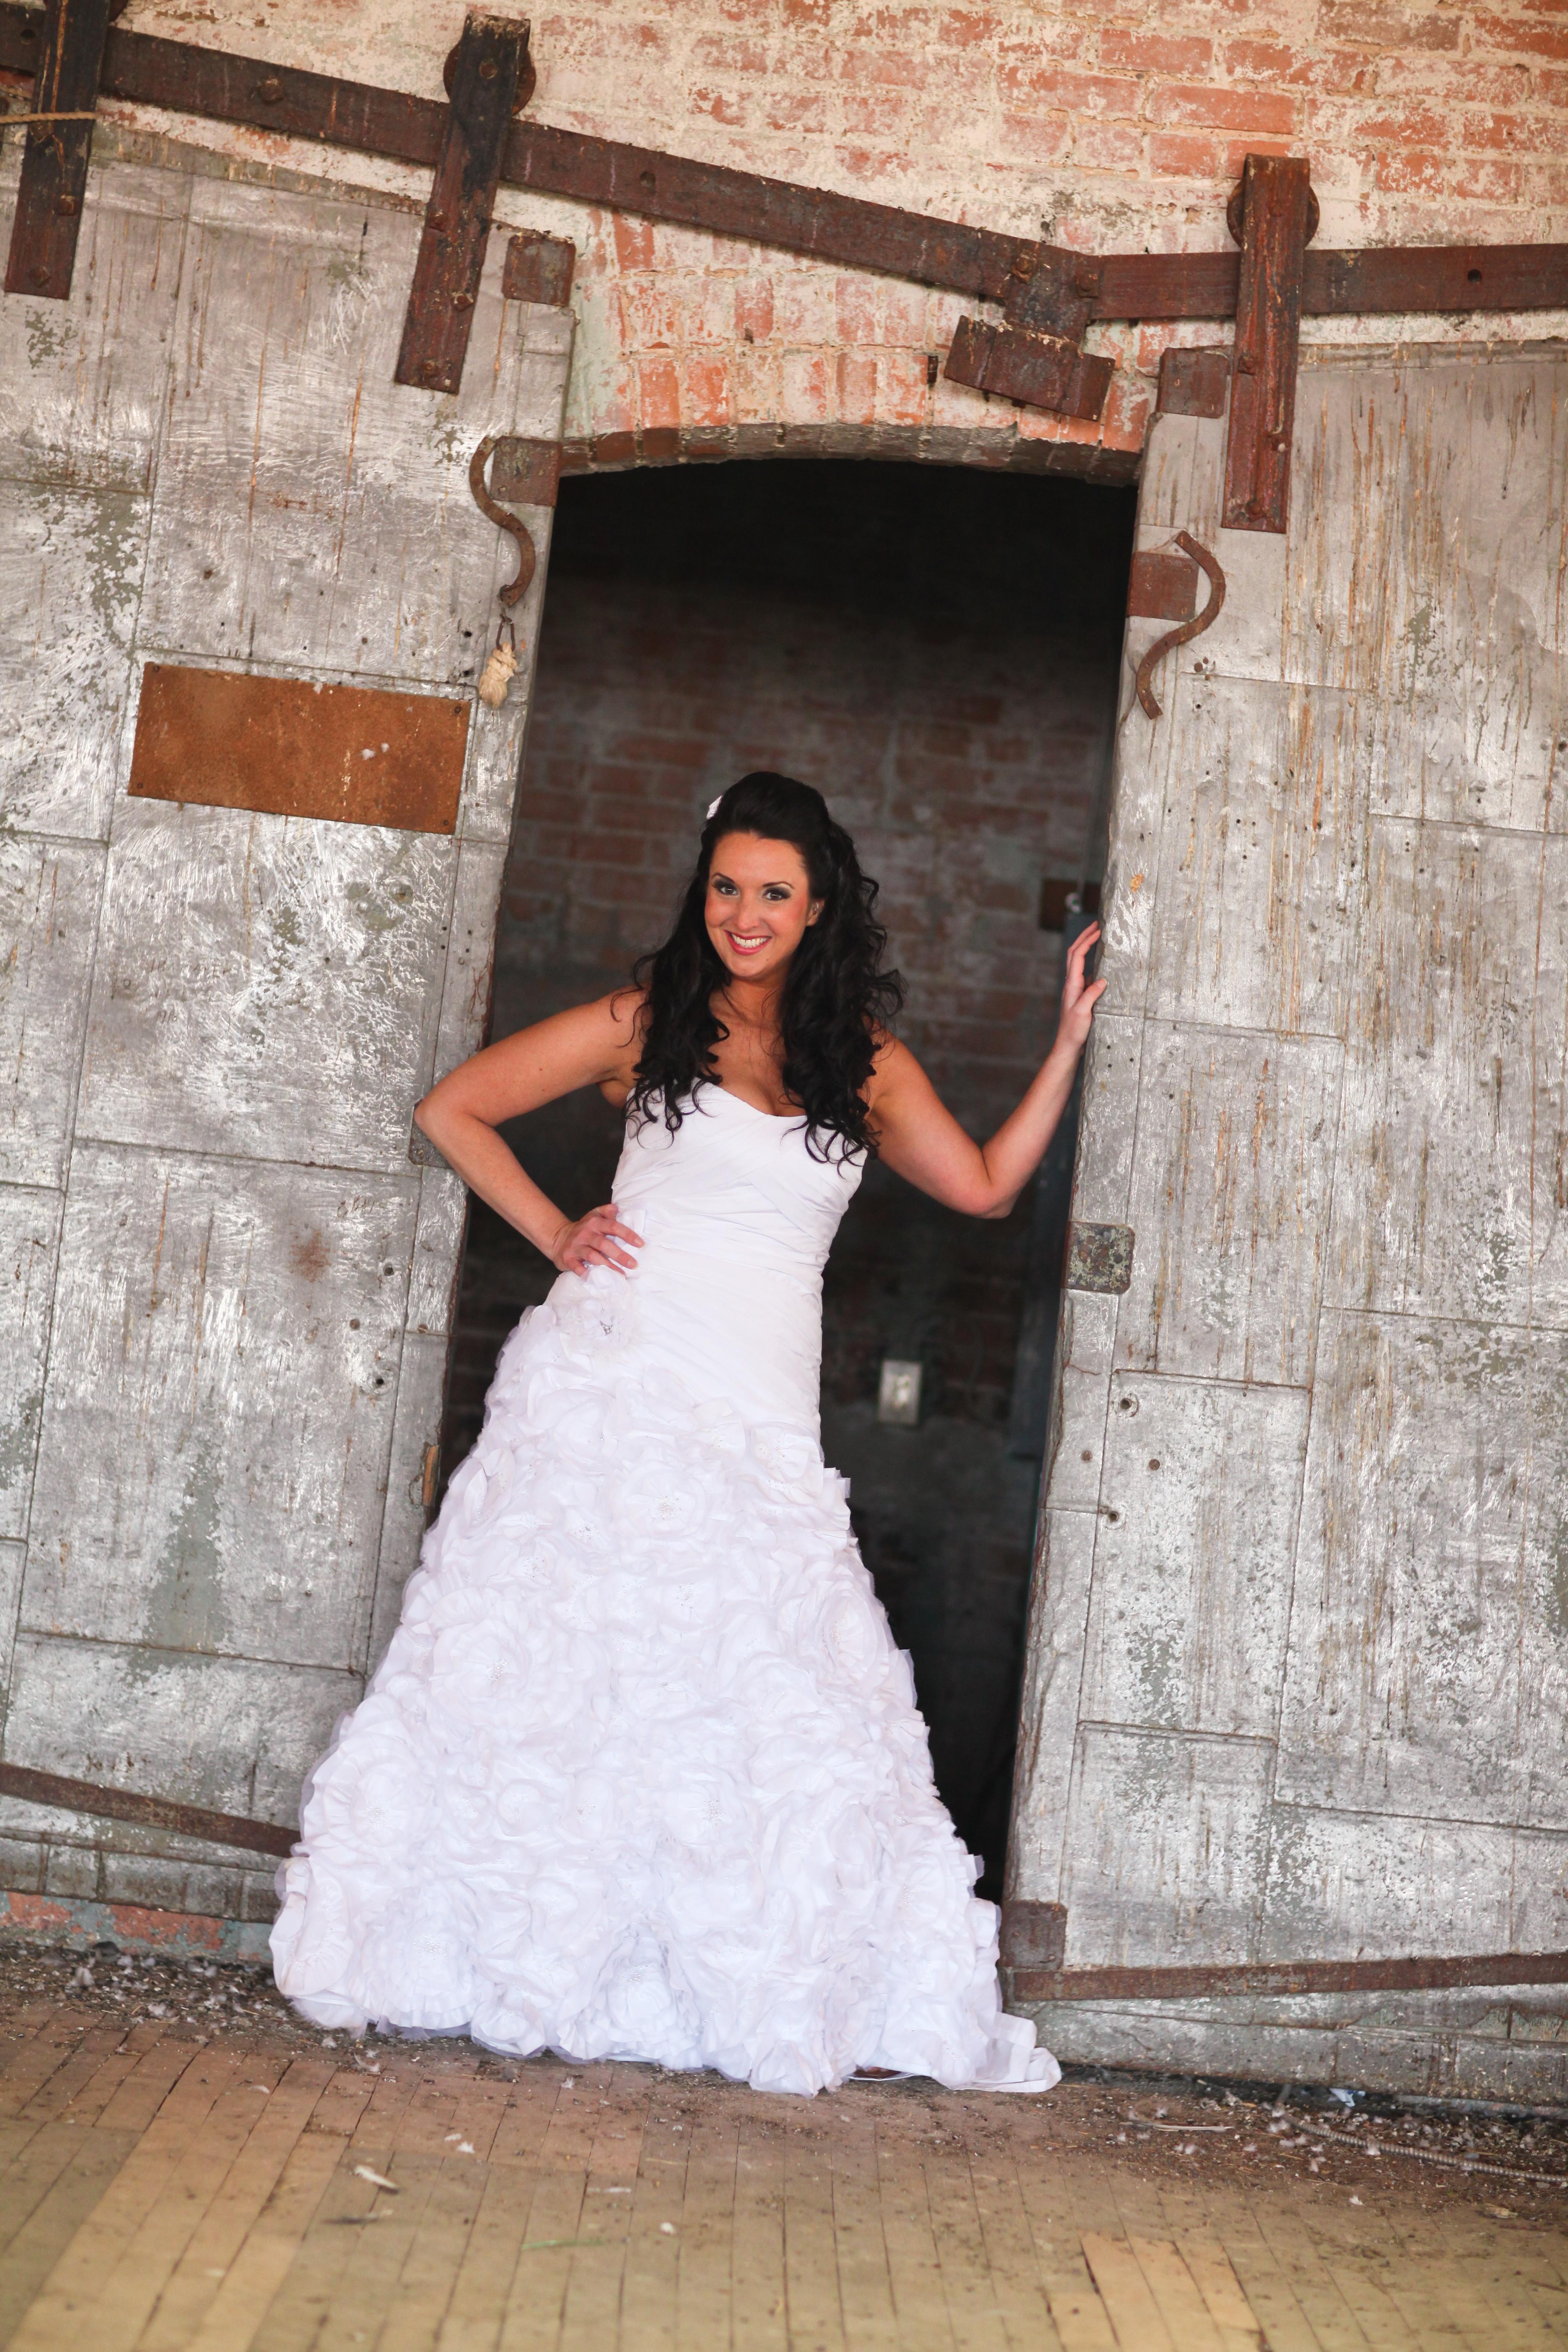 Wedding Dresses, Fashion, dress, Portraits, Bridal, Rock the dress, Thatcher photography, Mckinney cotton mill